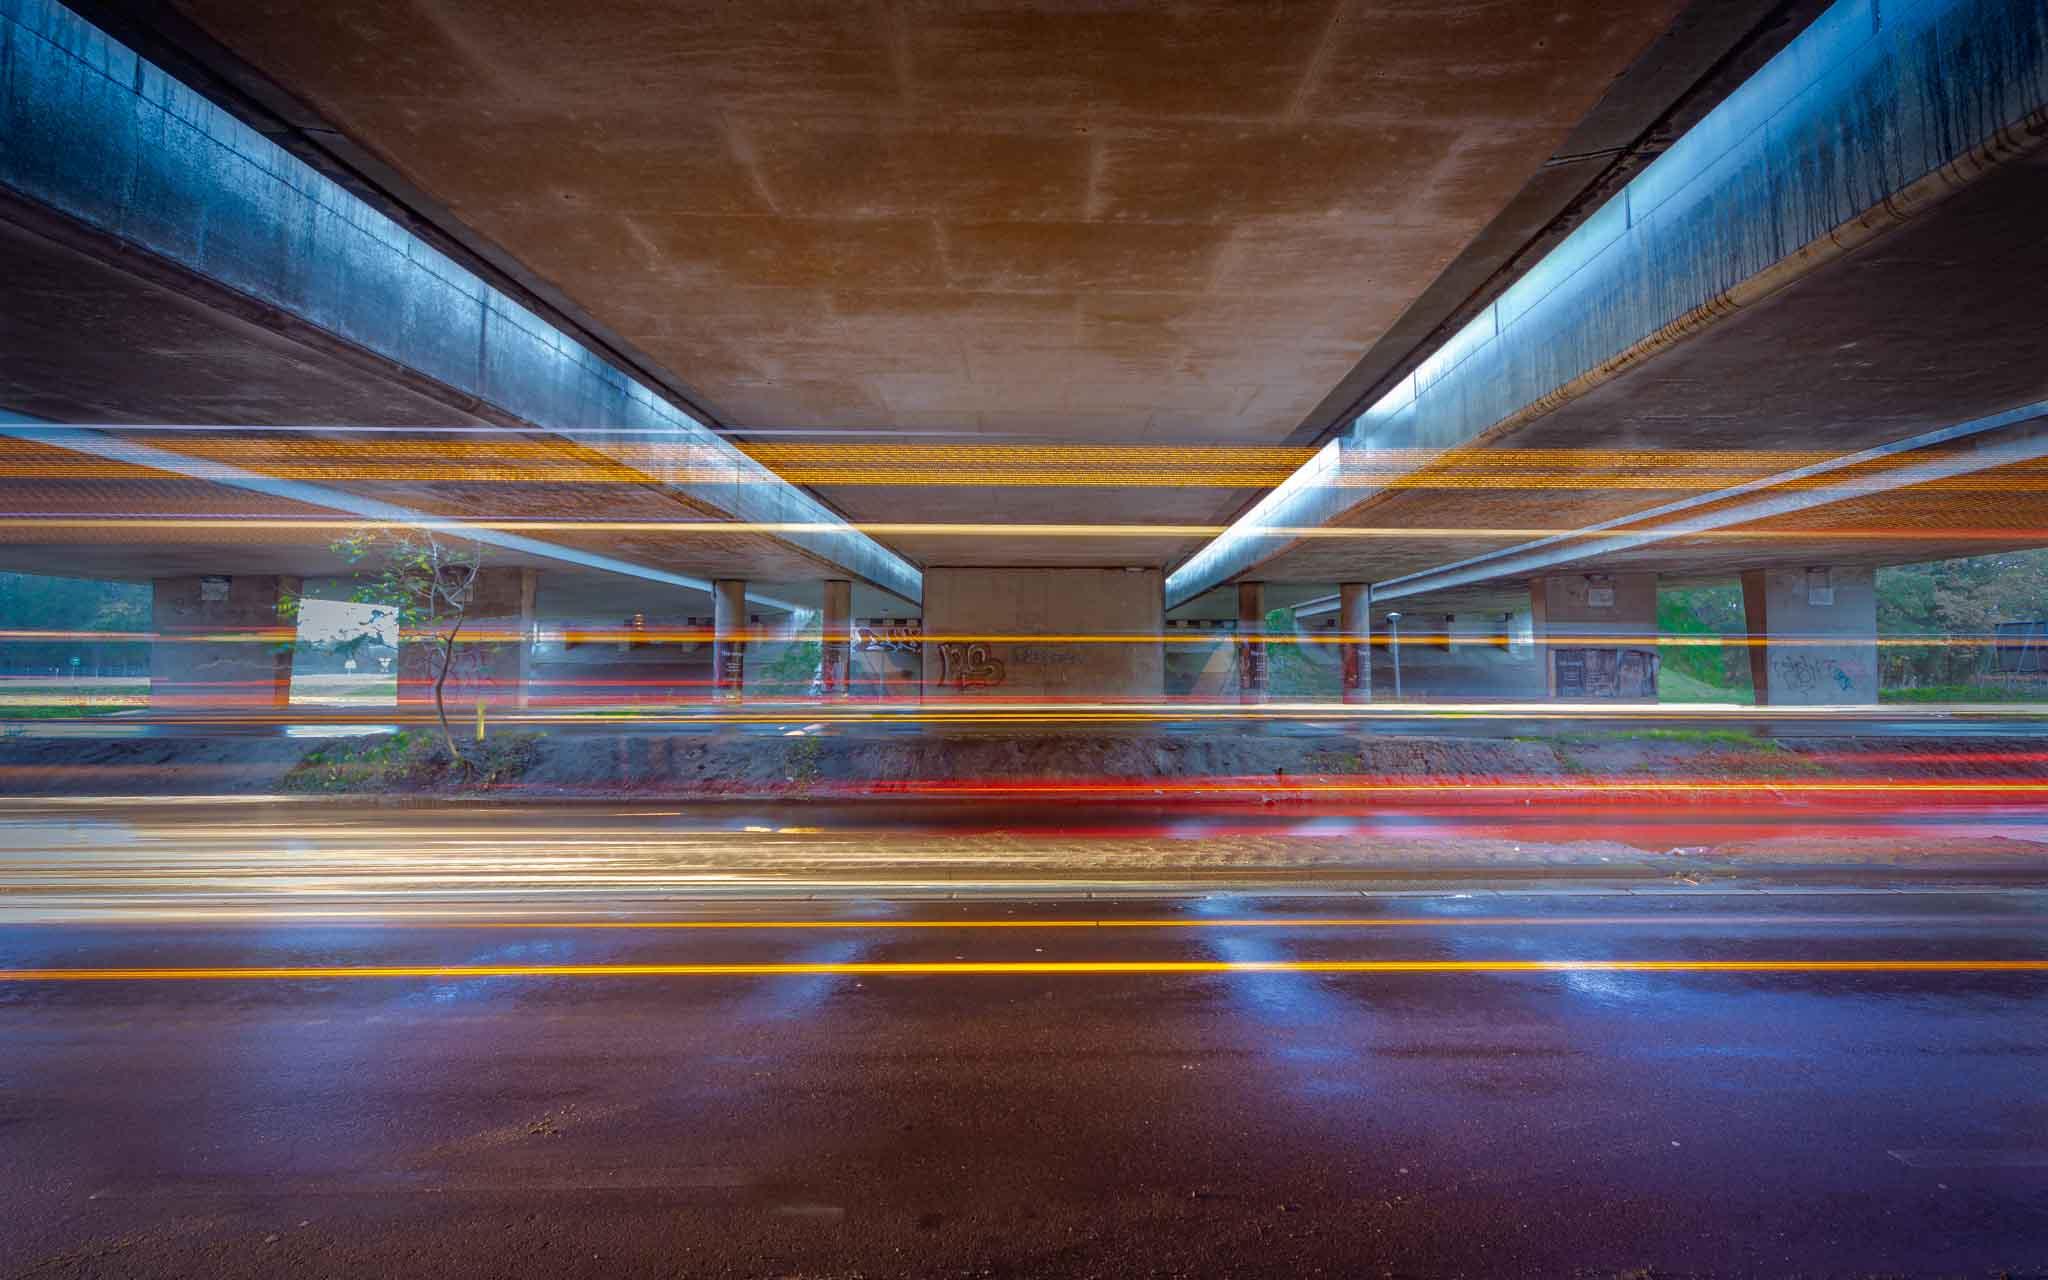 Viaduct A4, Amsterdam